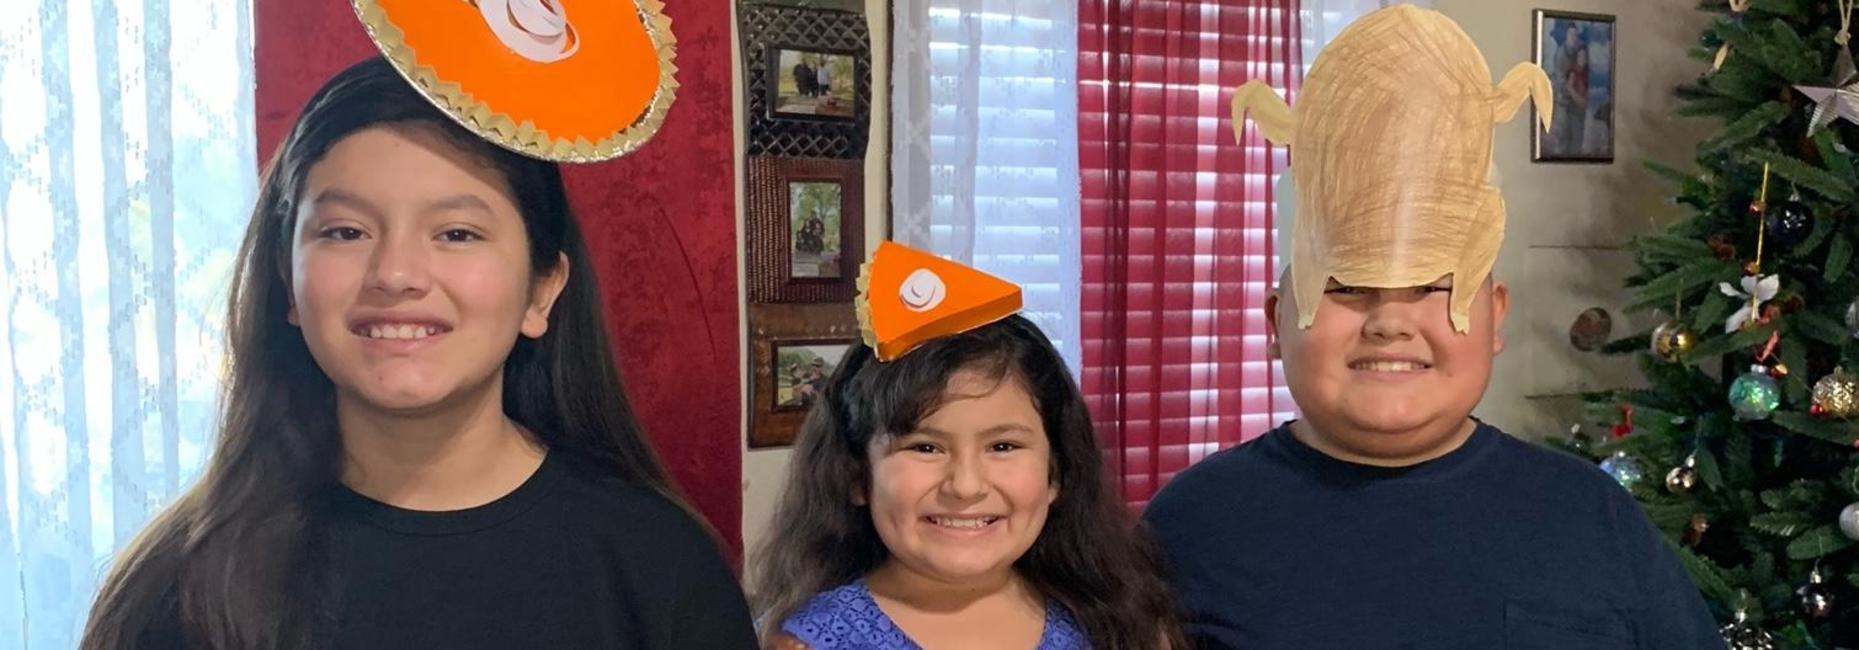 Creative Thanksgiving Hats